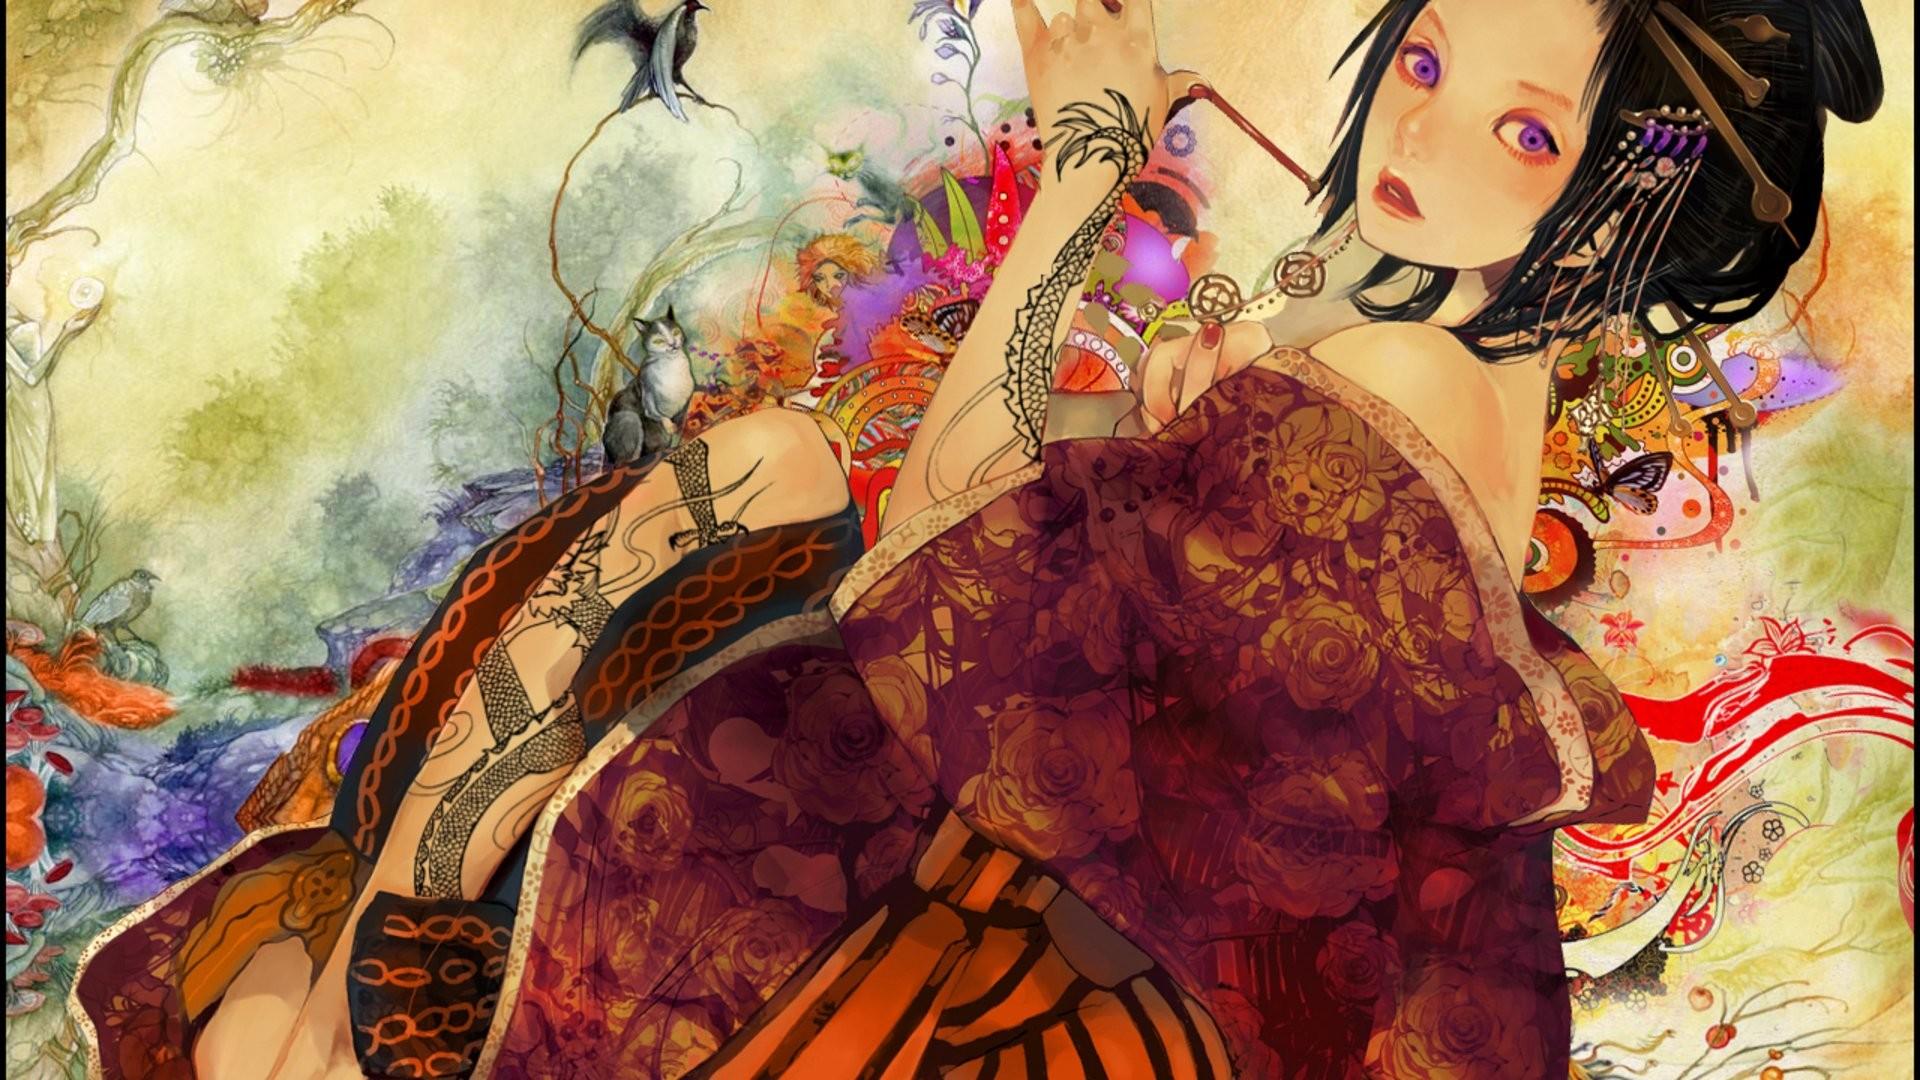 Res: 1920x1080, Tattoos geisha purple eyes Japanese clothes black hair bare shoulders  wallpaper      255268   WallpaperUP